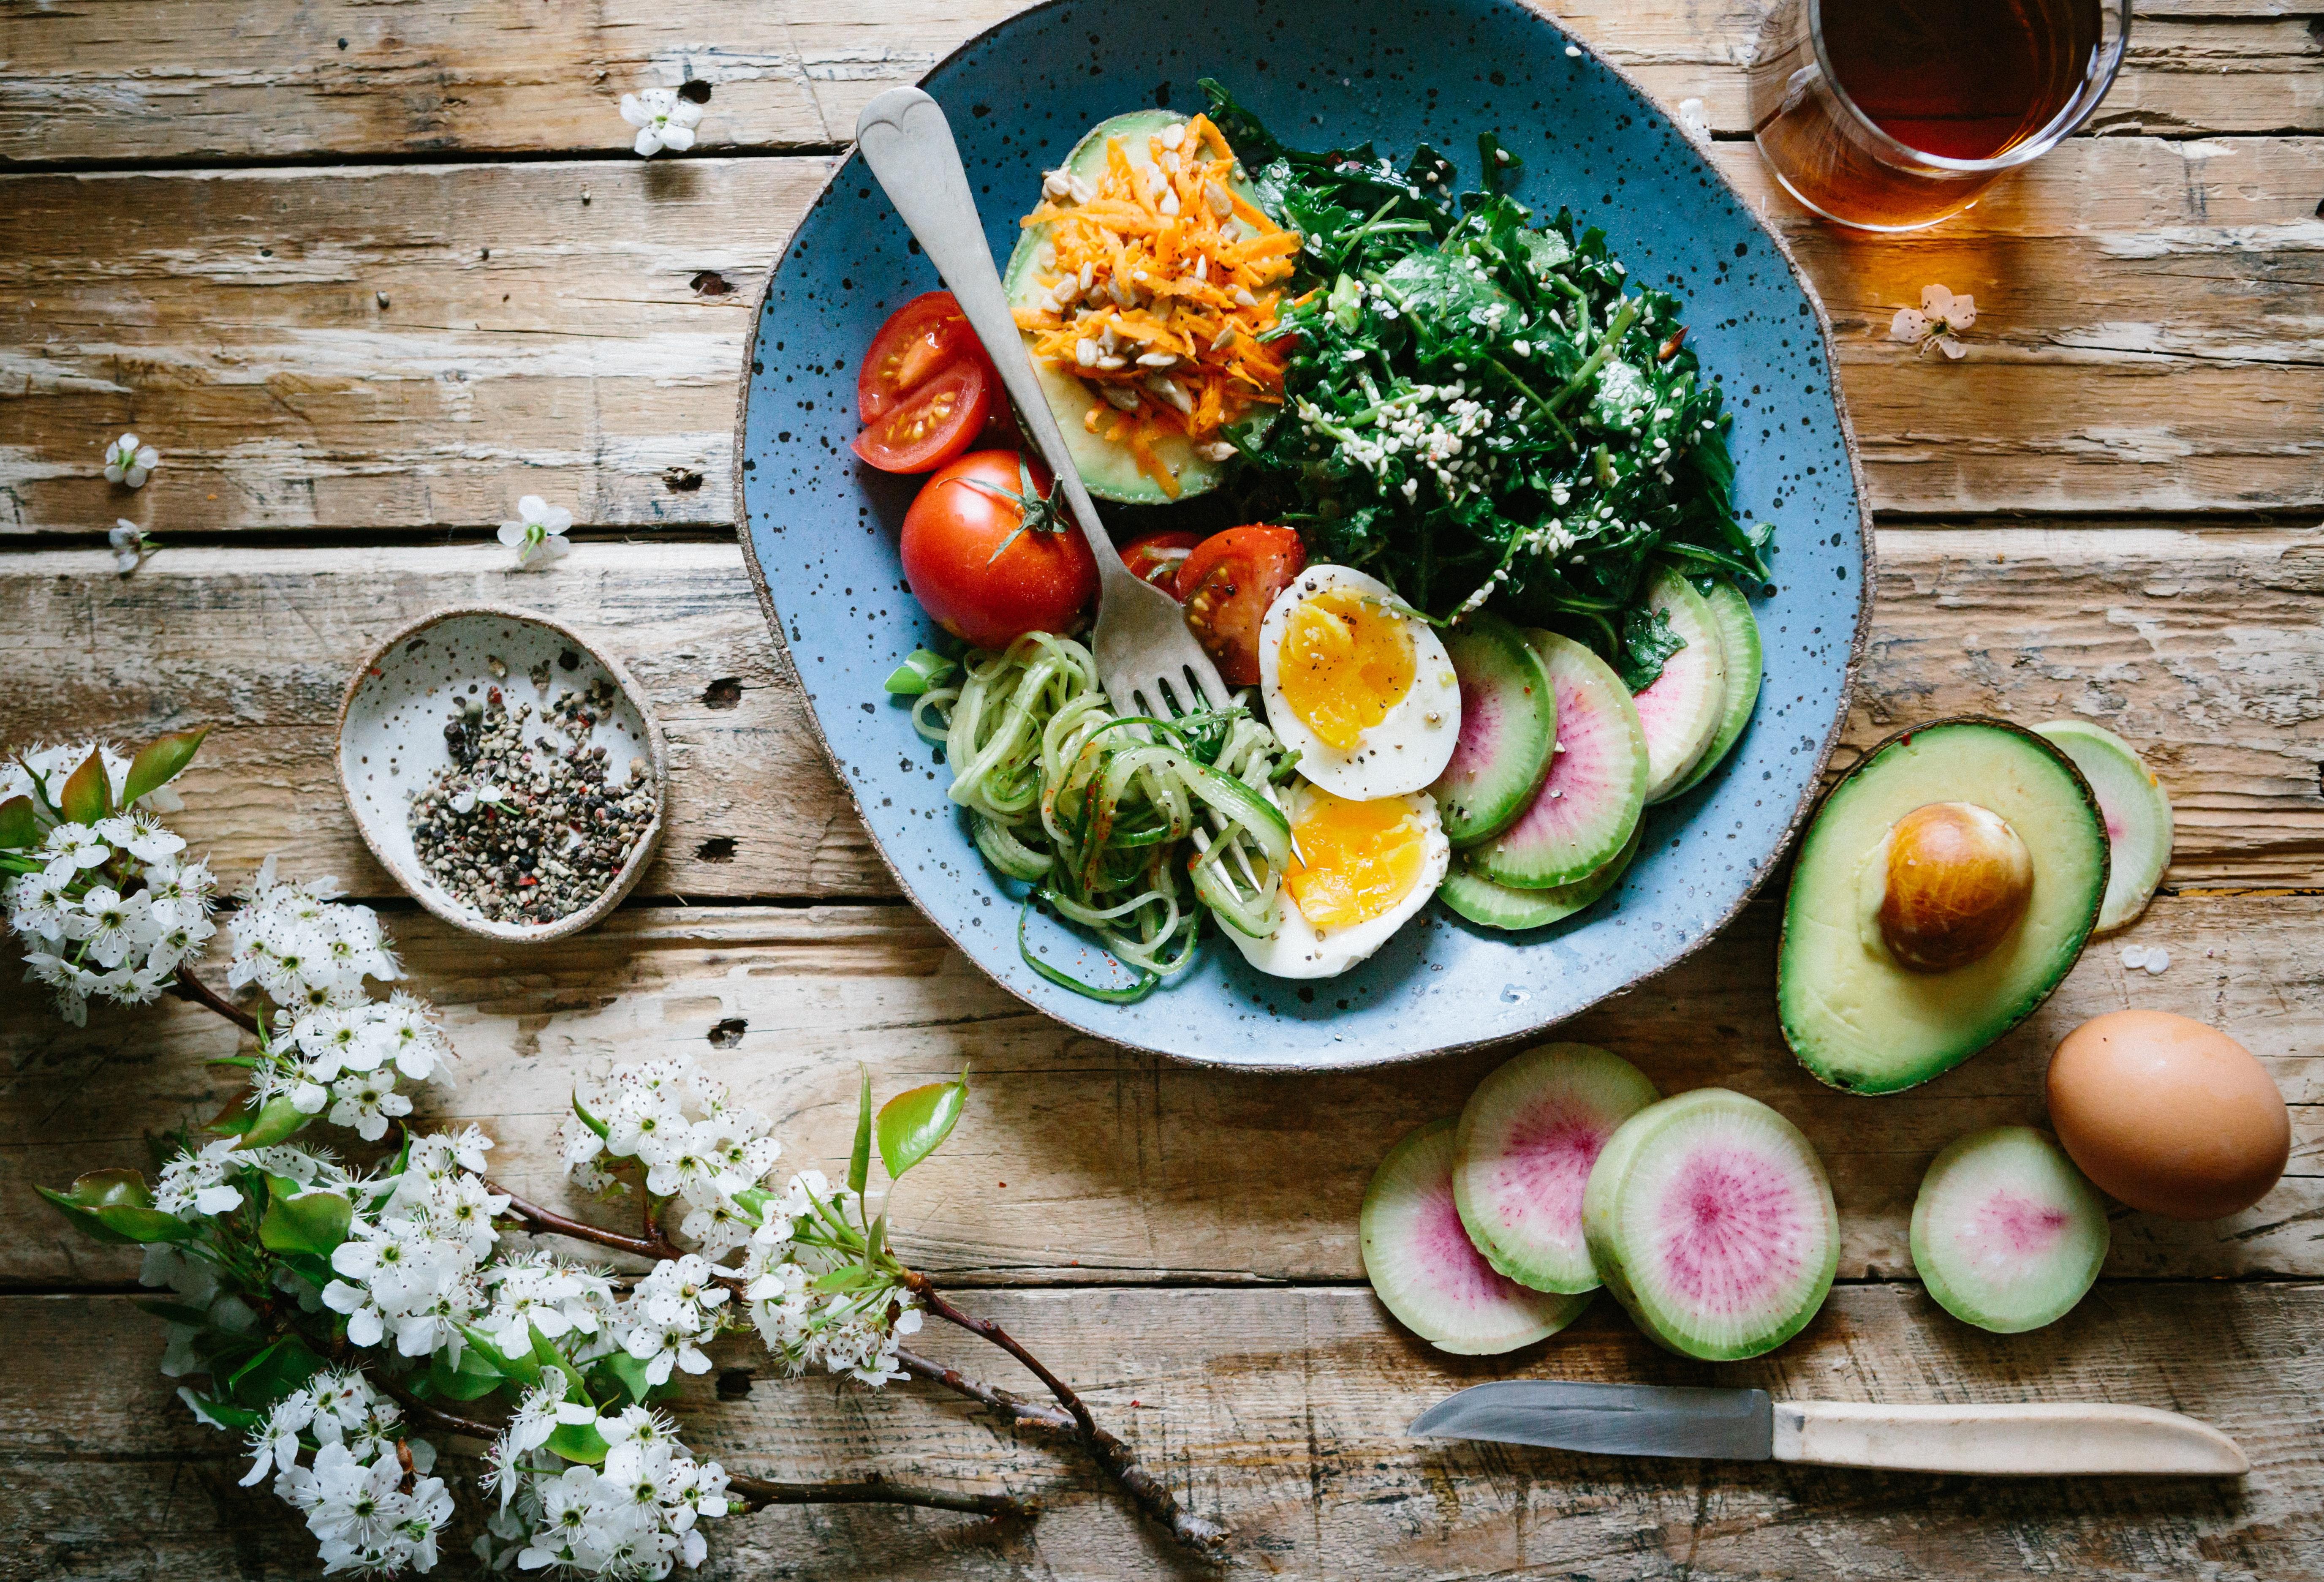 Health & Wellness Chat: Weight Management